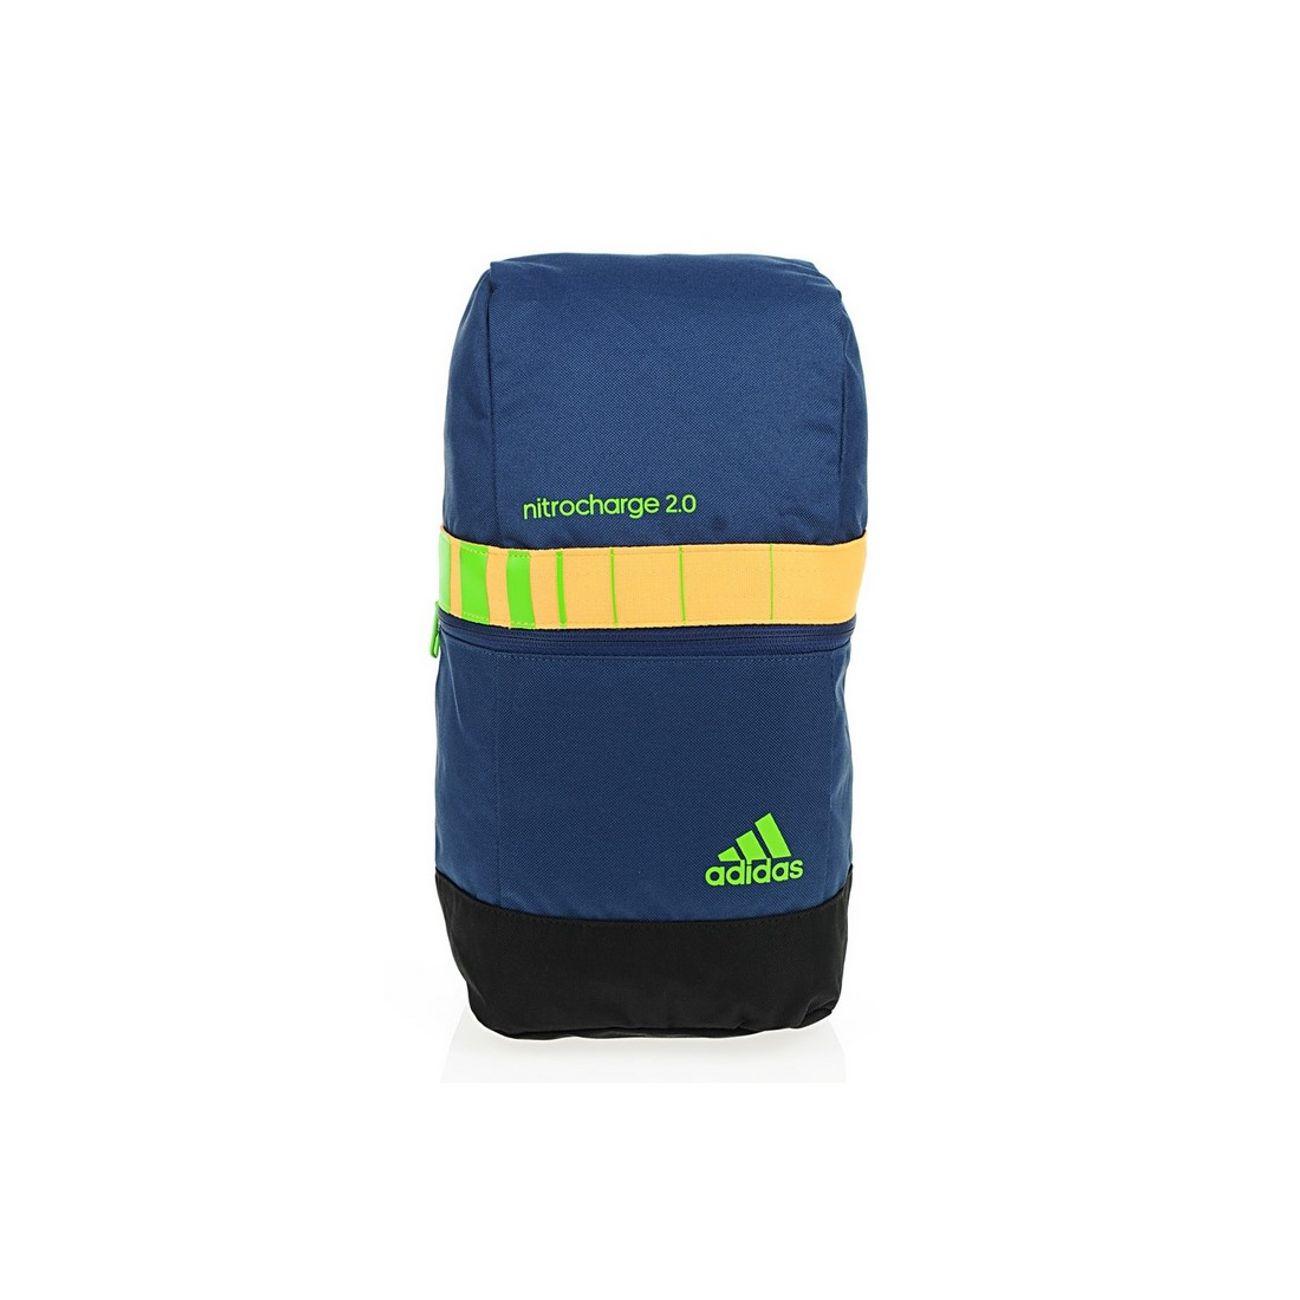 De Bleu G91460 Sport Bag Bagagerie Adidas vert U Canta Sac LSUqzGVMp